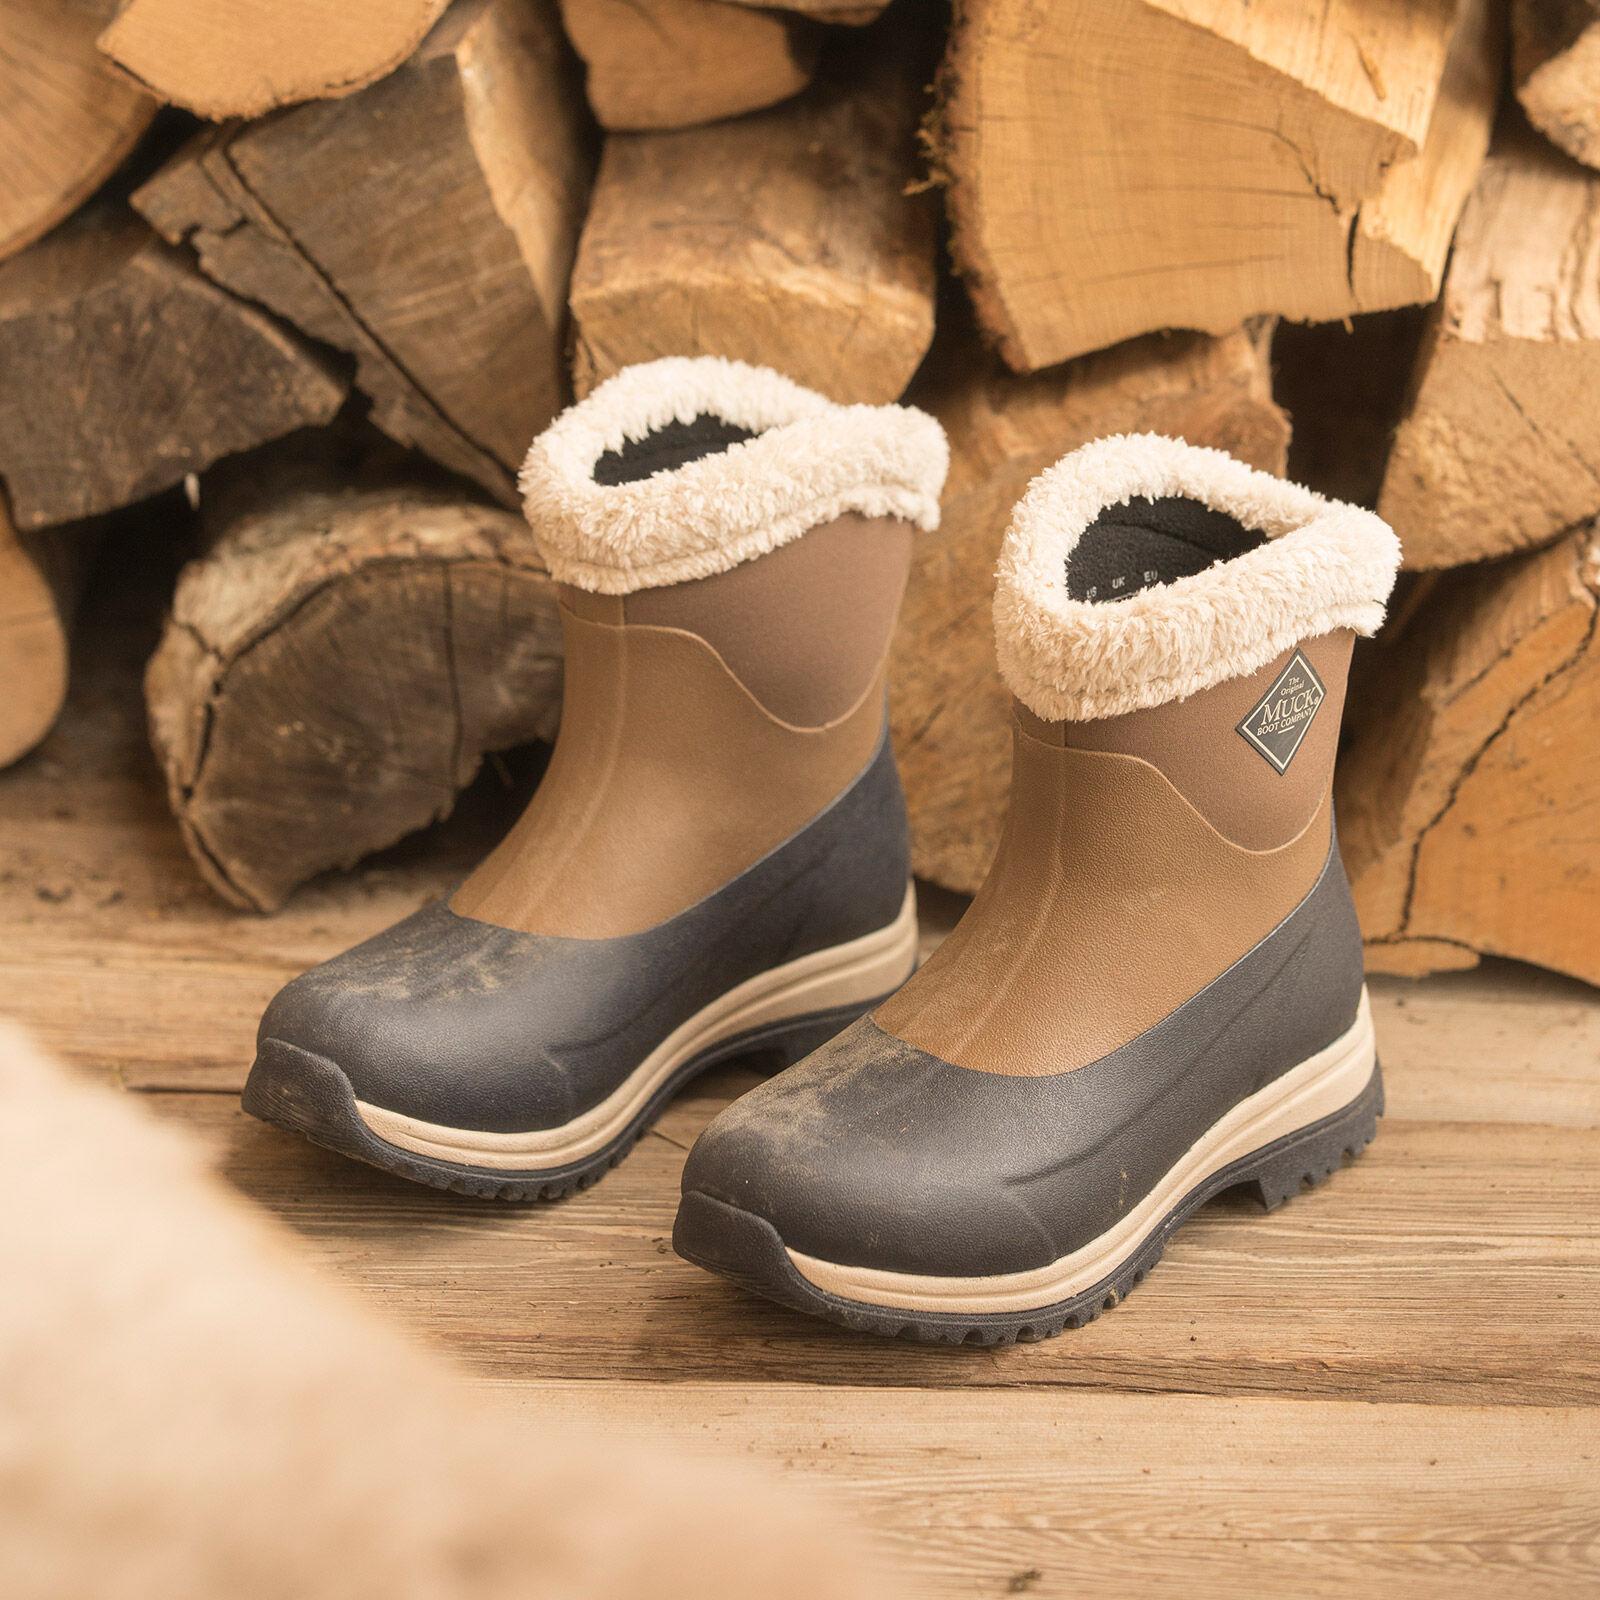 Köp Muck Boot Arctic Apres Winter stövle | horze.se